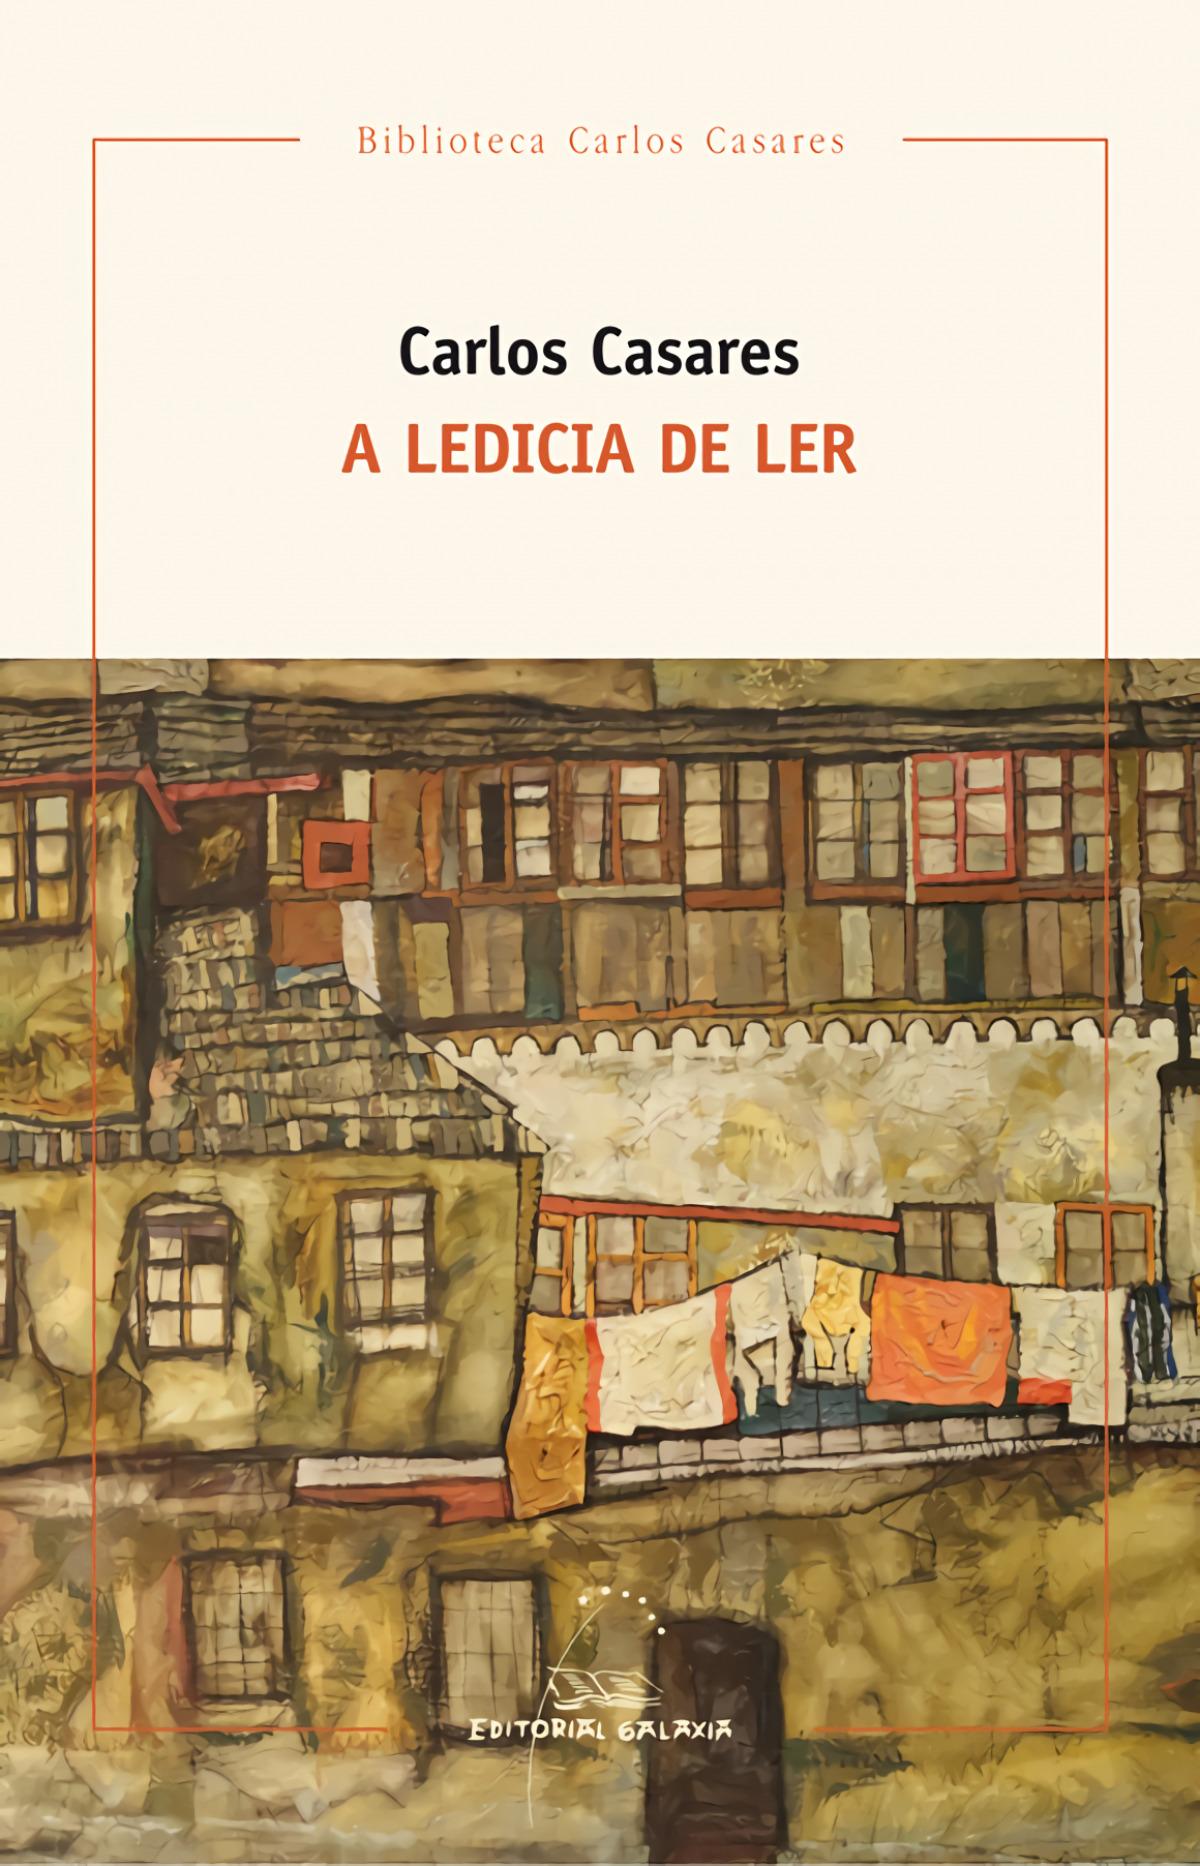 A LEDICIA DE LER, 1975-1992